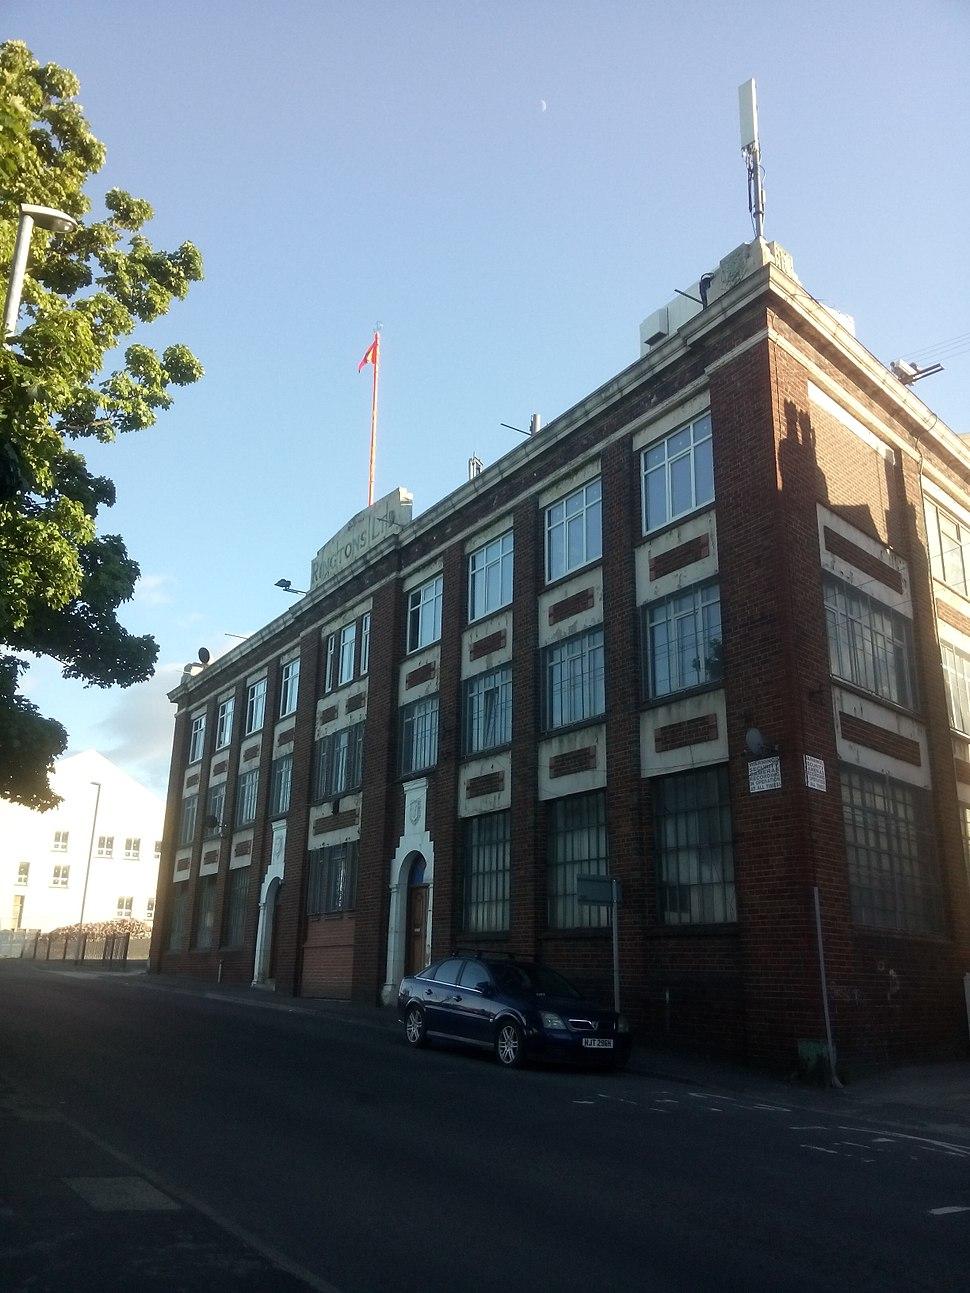 Guru Nanak Nishkam Sewak Jatha (Leeds) UK Gurdwara-Former Ringtons Tea Packing Factory